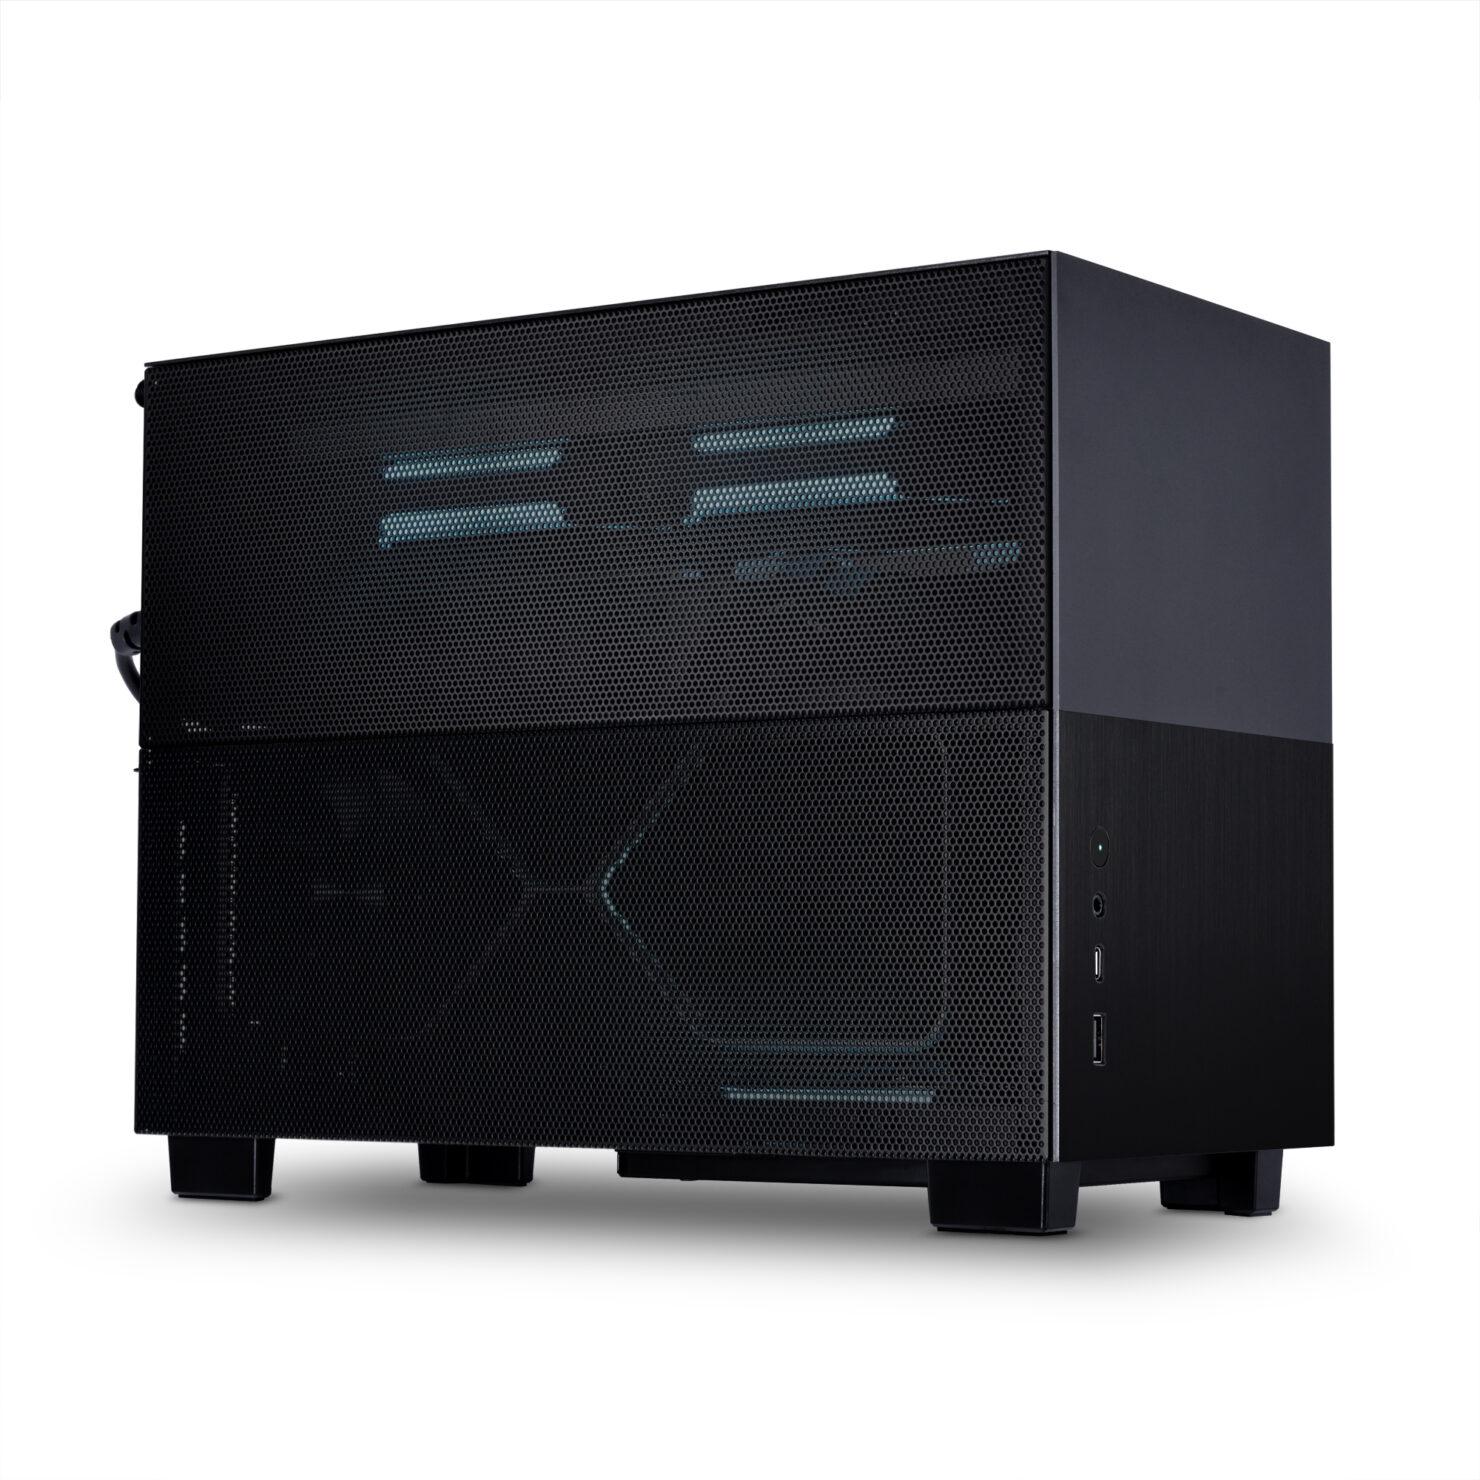 q58-mesh-panel-kit-01